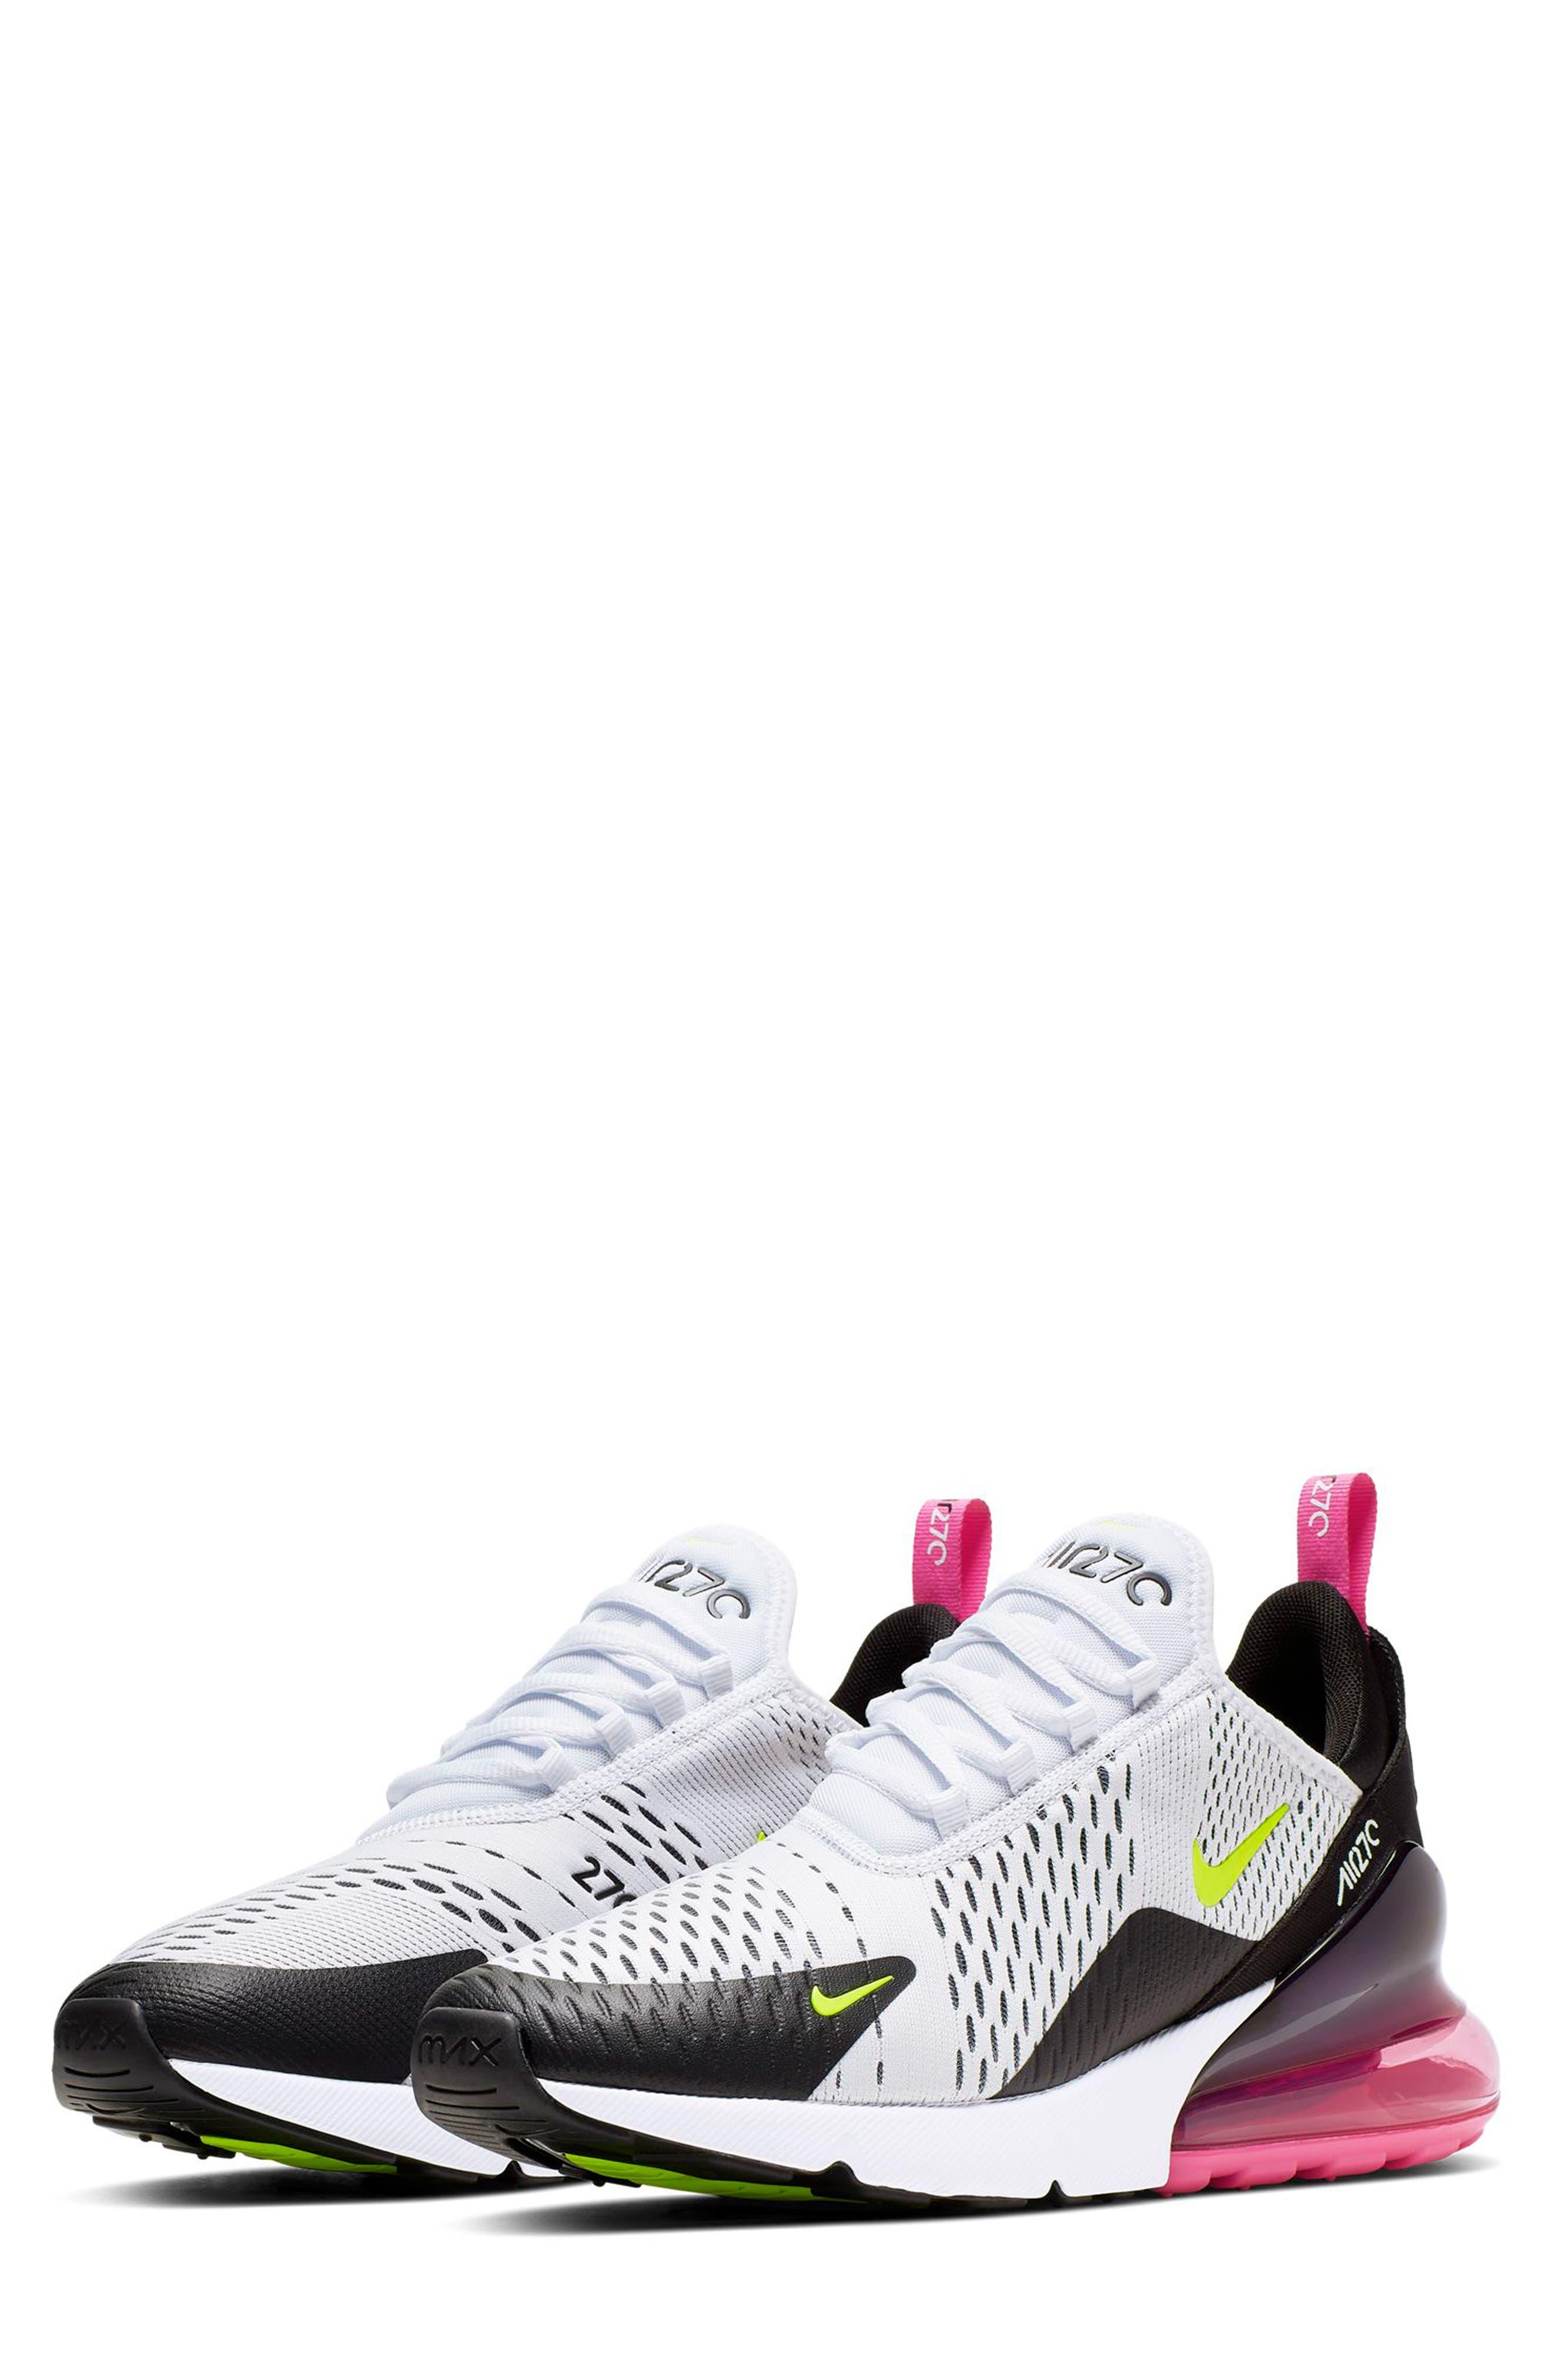 Air Max 270 Sneaker, Main, color, WHITE/ VOLT/ BLACK/ FUCHSIA